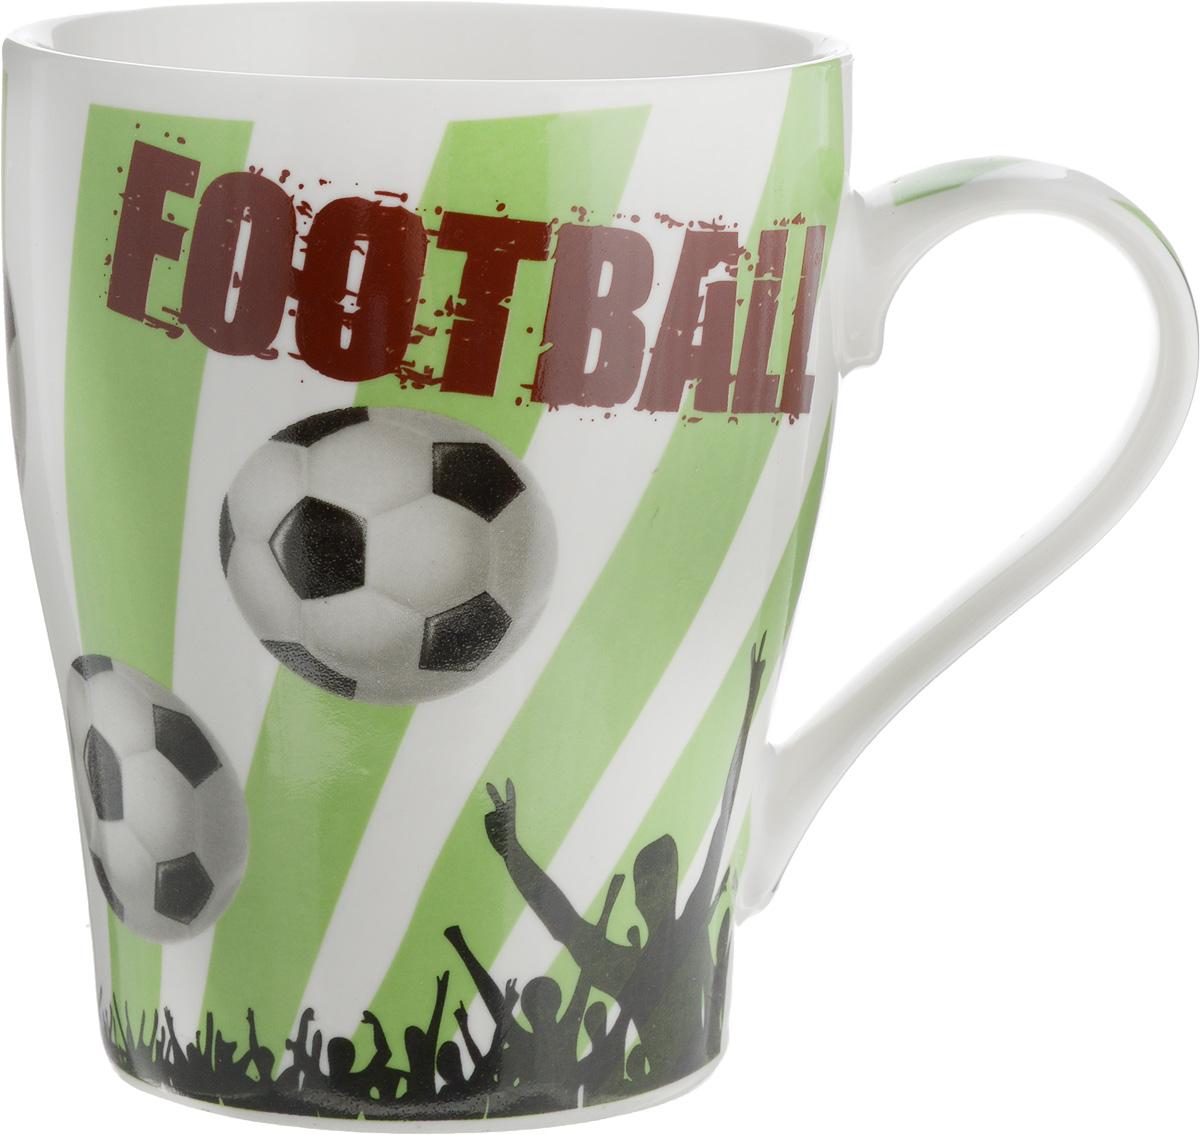 Кружка Loraine Футбол, 340 мл. 26653-1 кружка loraine футбол 340 мл 26652